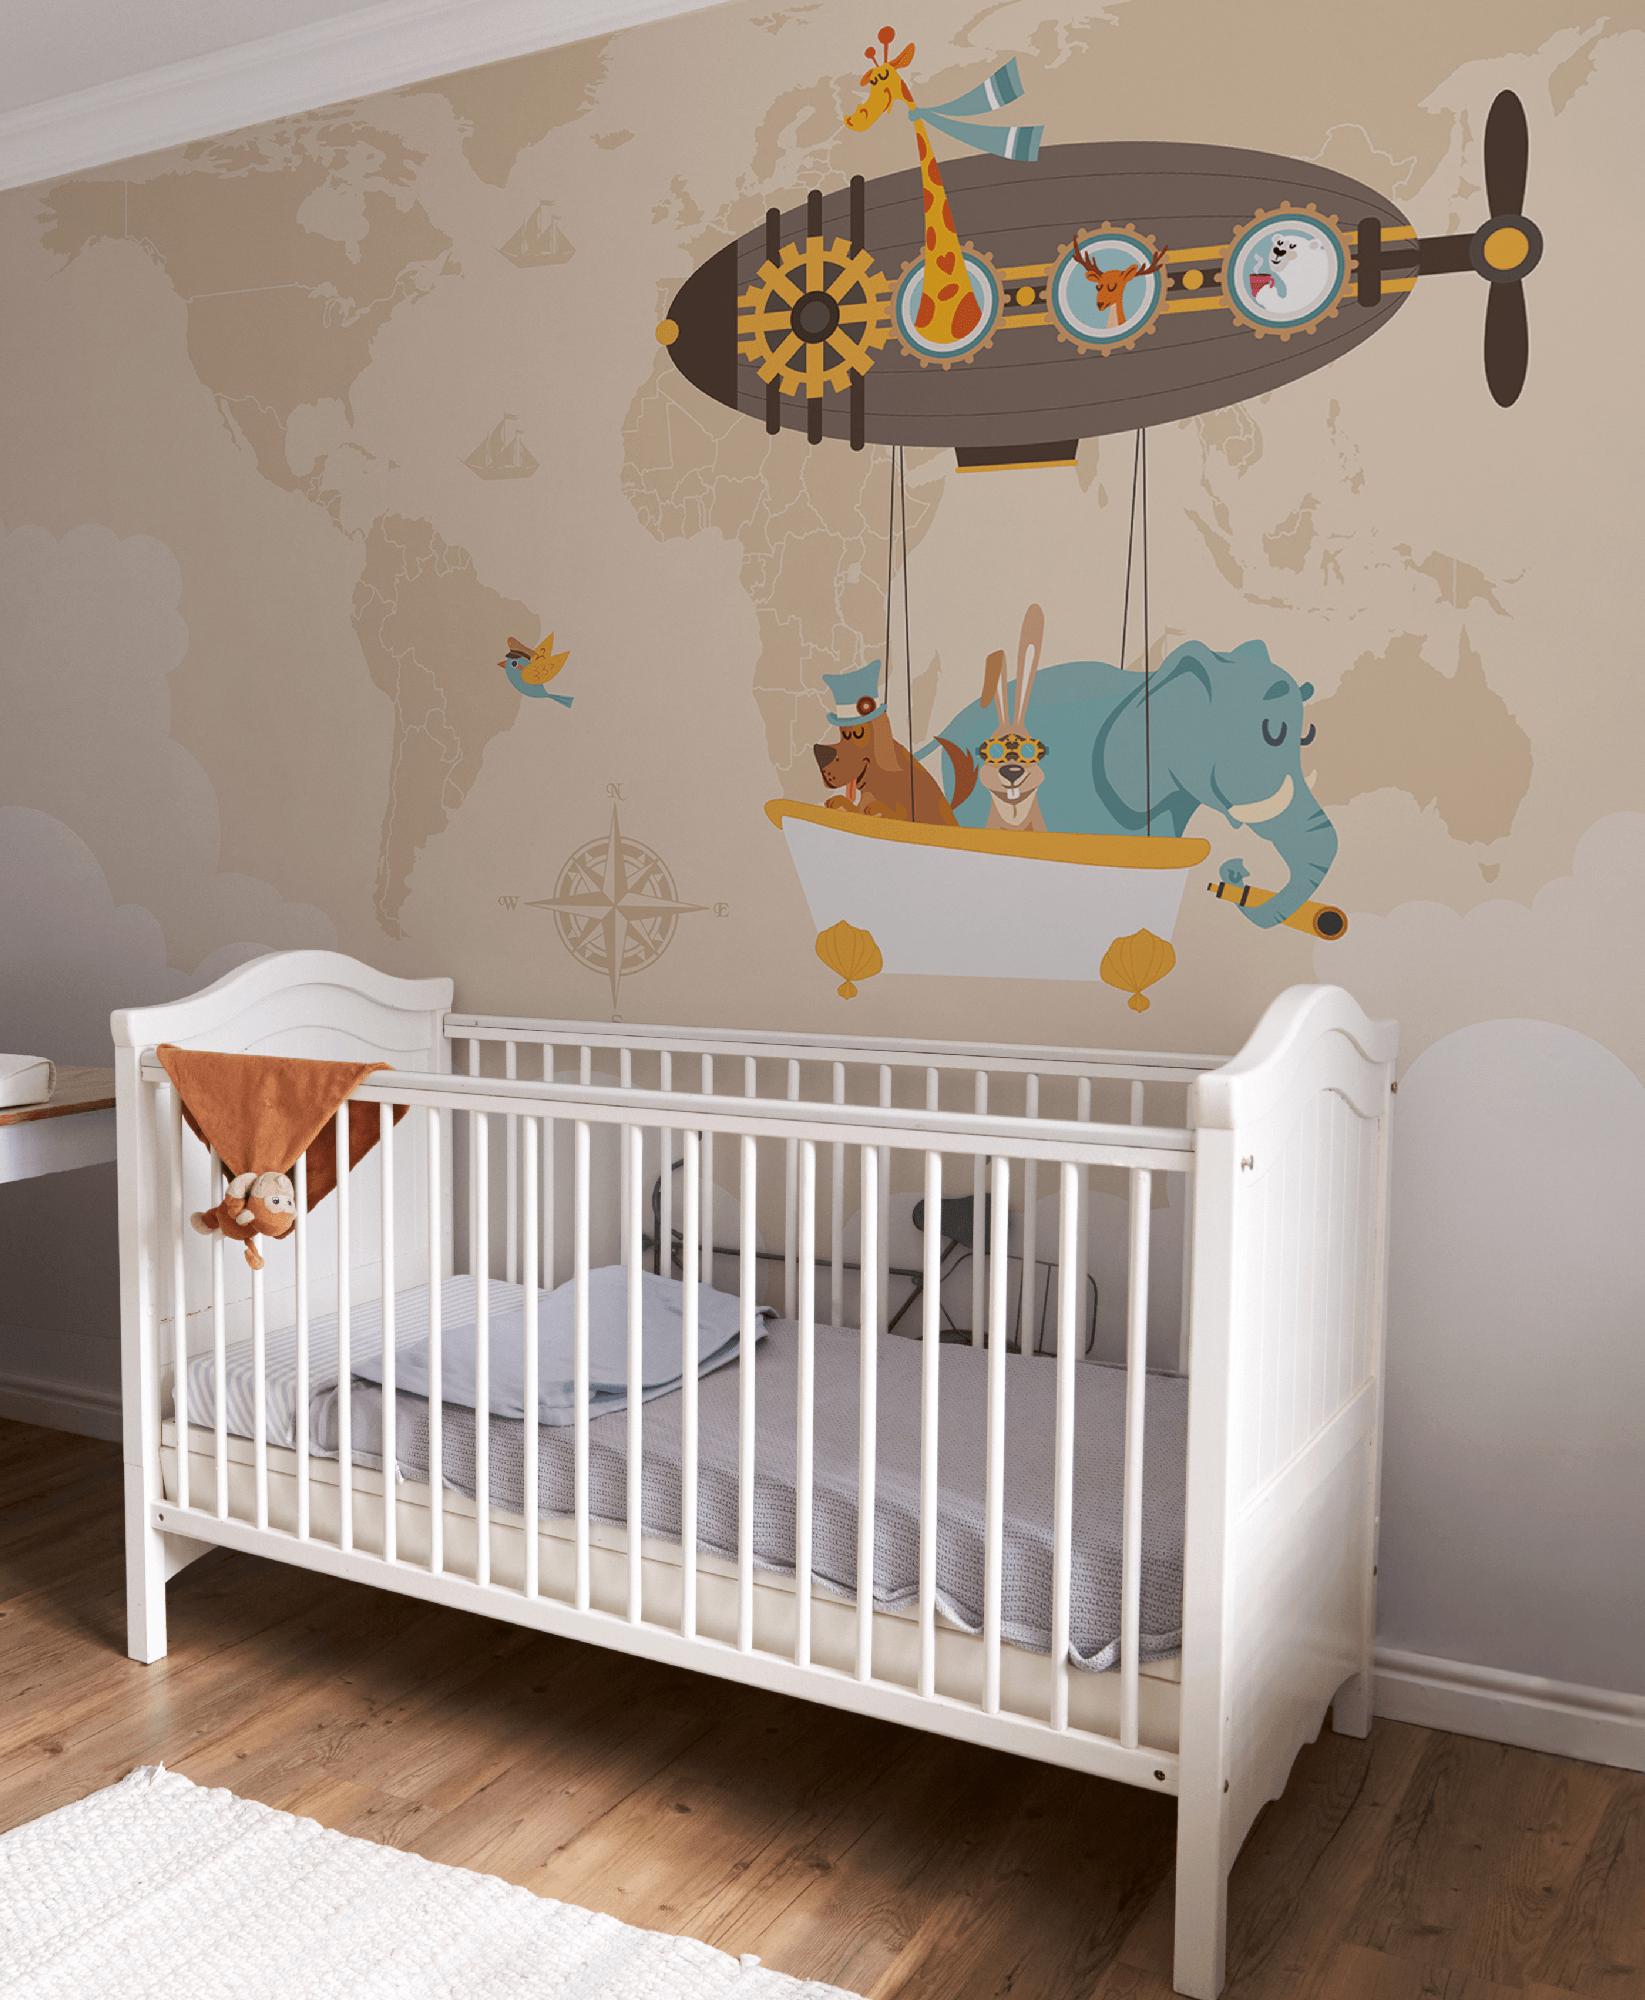 Around the world carta da parati per bambini baby for Carta da parati 2016